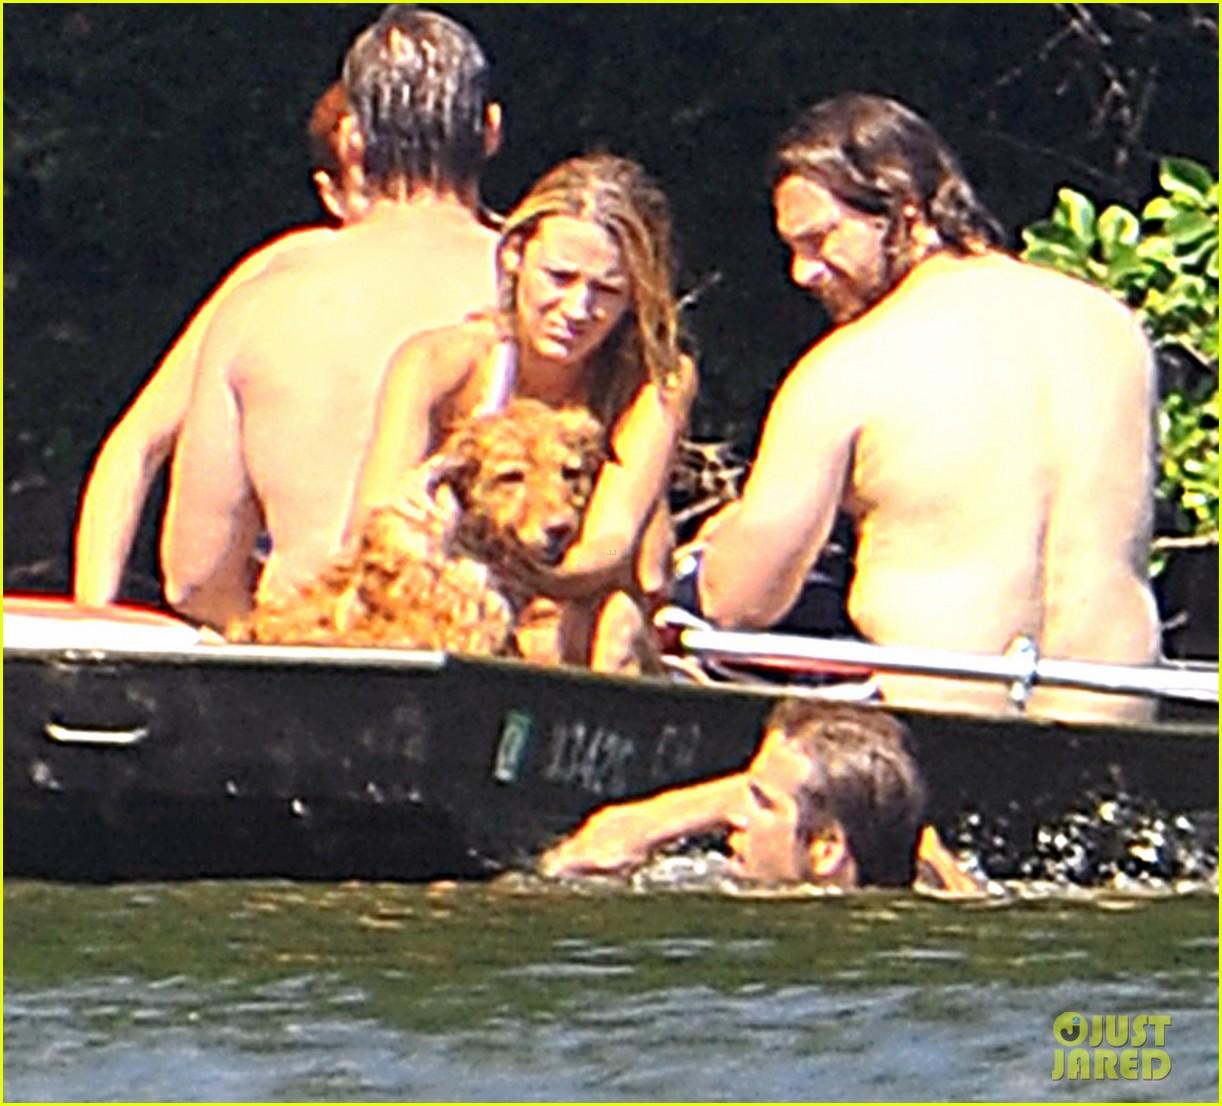 http://1.bp.blogspot.com/-mReqoWGK7Yc/T_r5hsq5MaI/AAAAAAAAAOQ/pb-PX0cTGBE/s1600/blake-lively-ryan-reynolds-fourth-of-july-boat-01.JPG